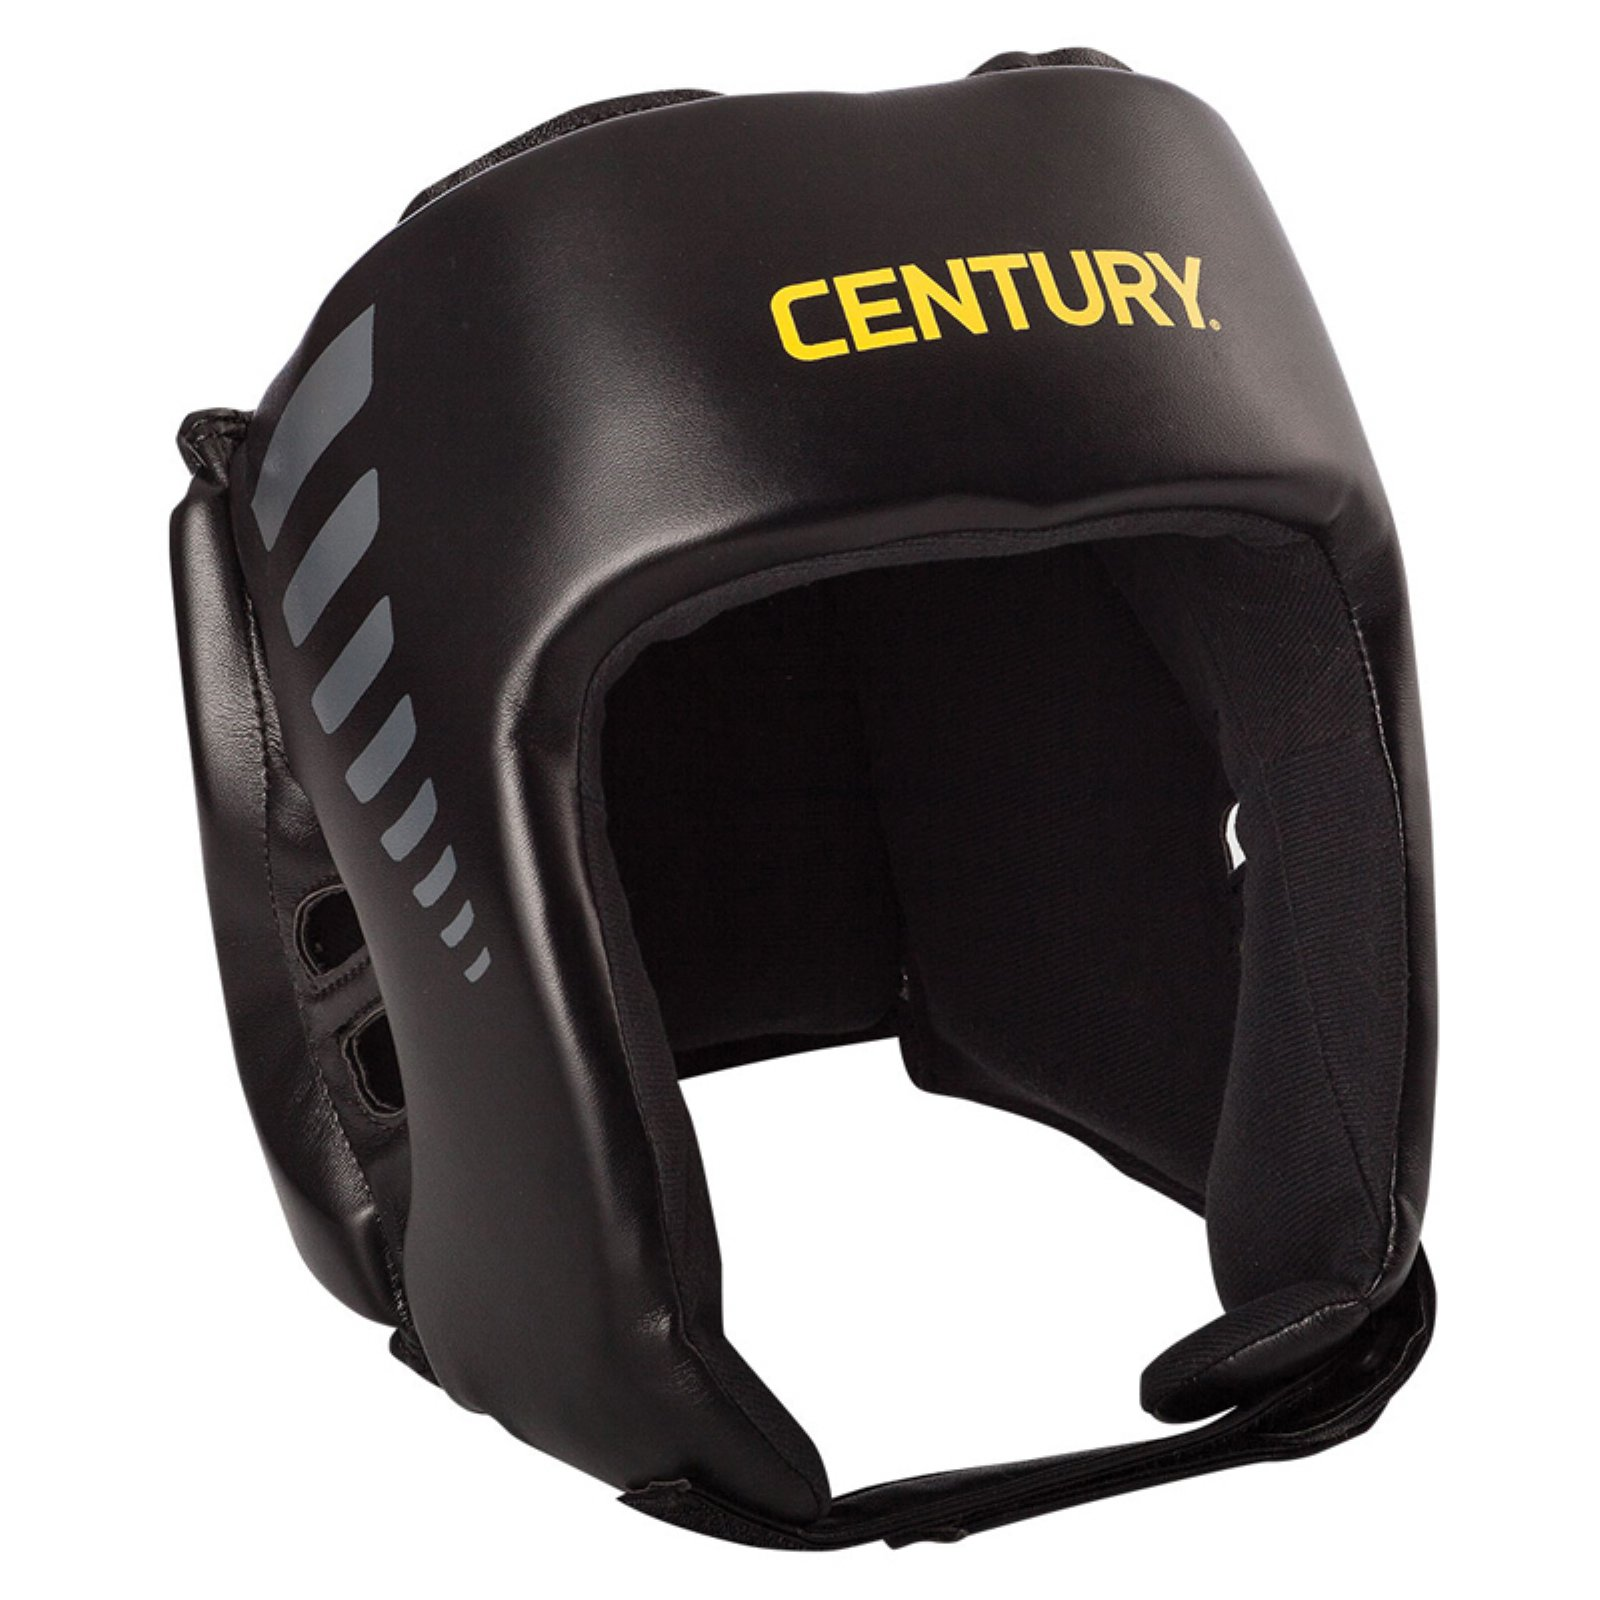 Century Brave Open-Face Headgear